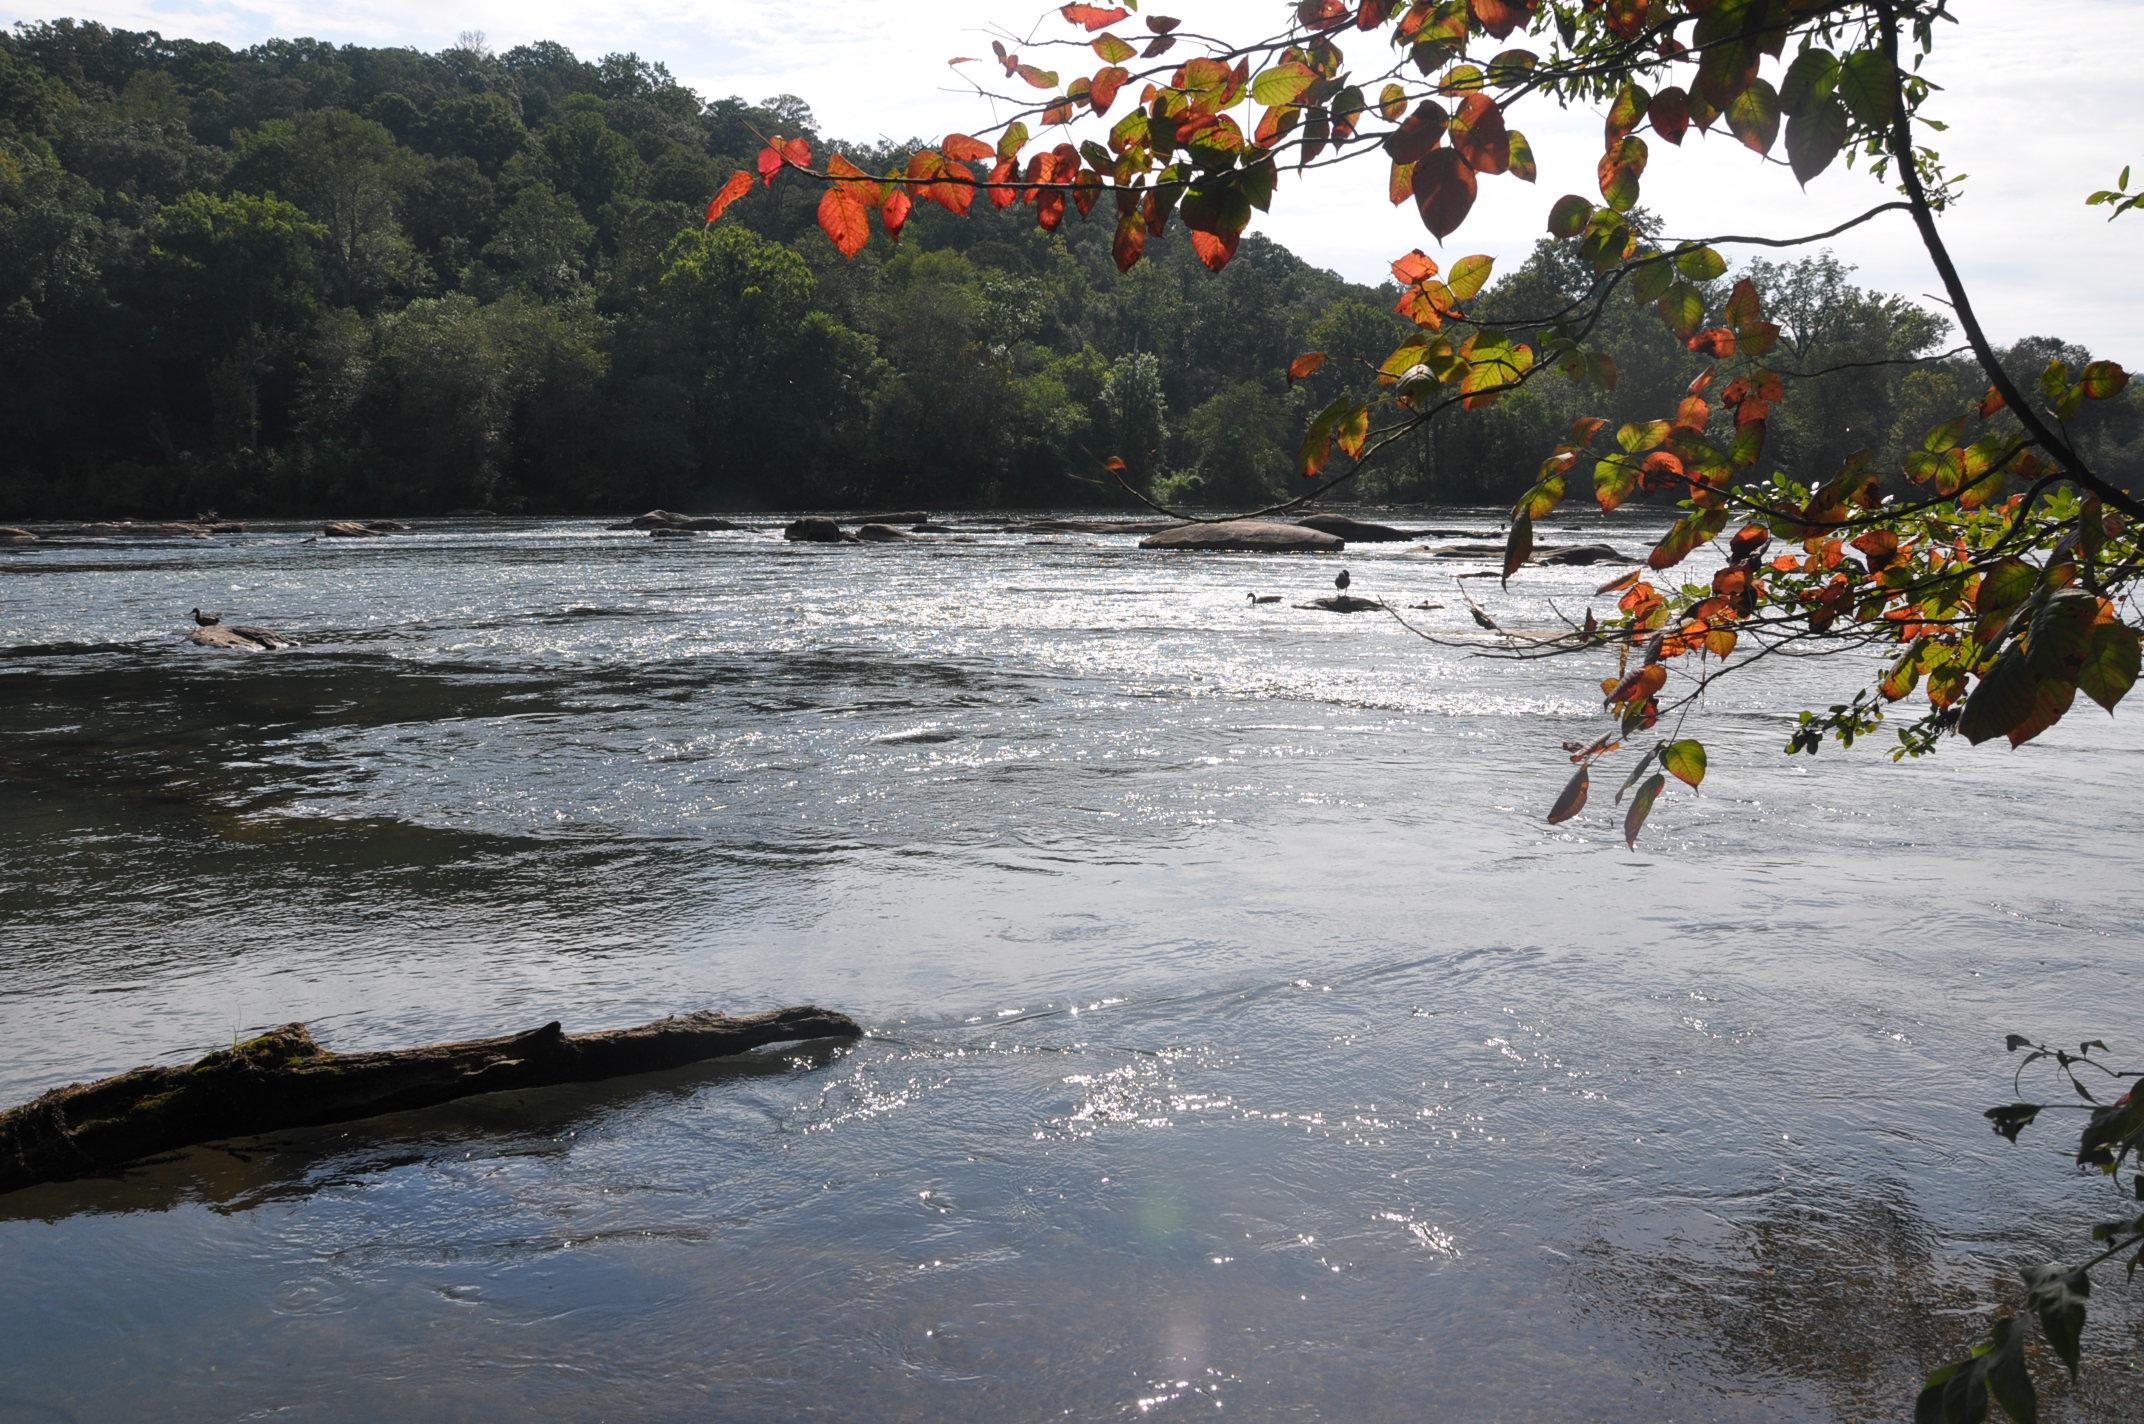 Chattahoochee River Near Roswell, GA